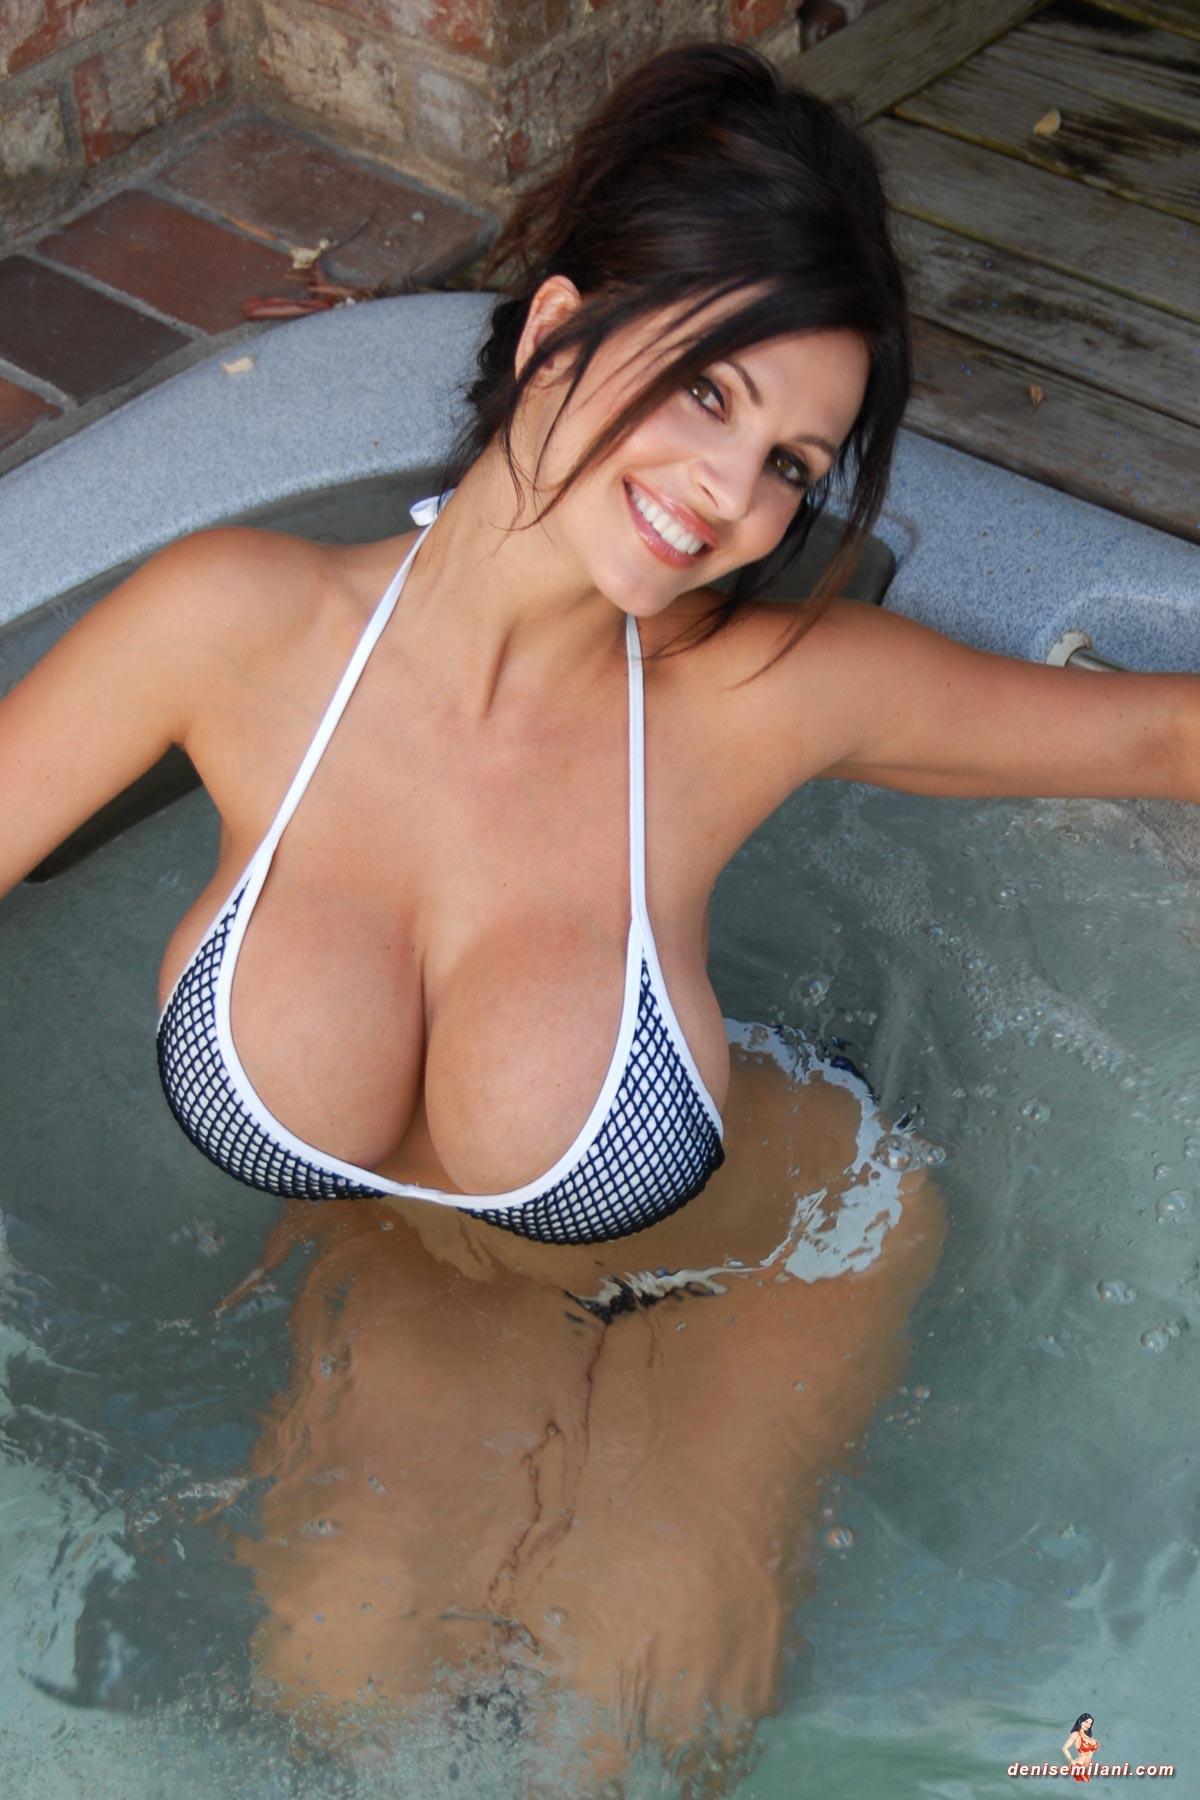 Denise-Milani-Hot-Tub-3  Sexy Women-6133